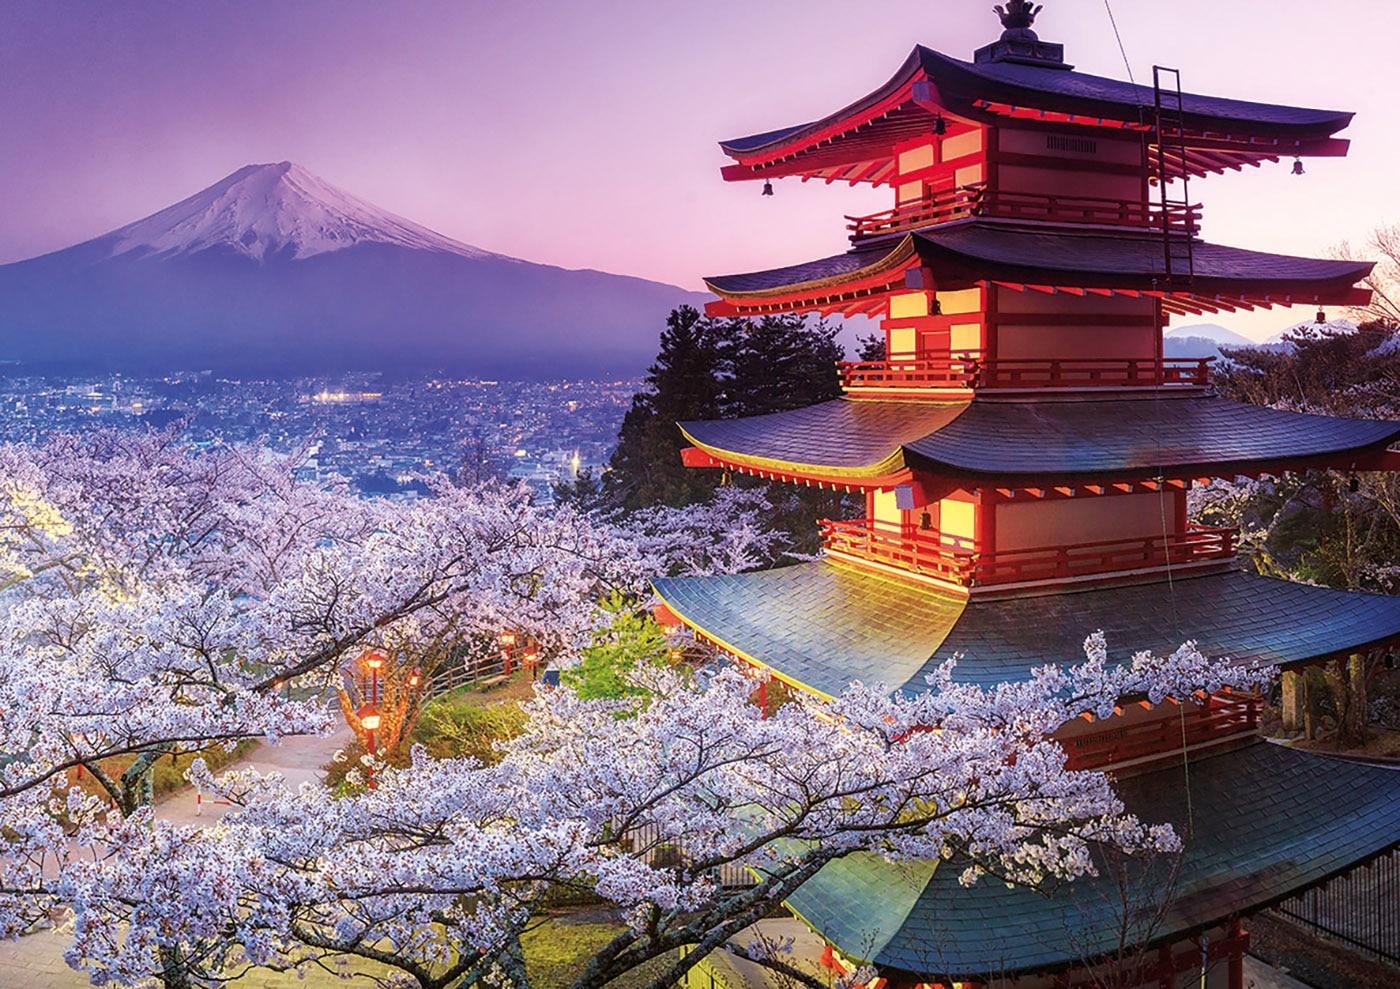 Educa japon Mt. Fuji puzzle 2000 pièces